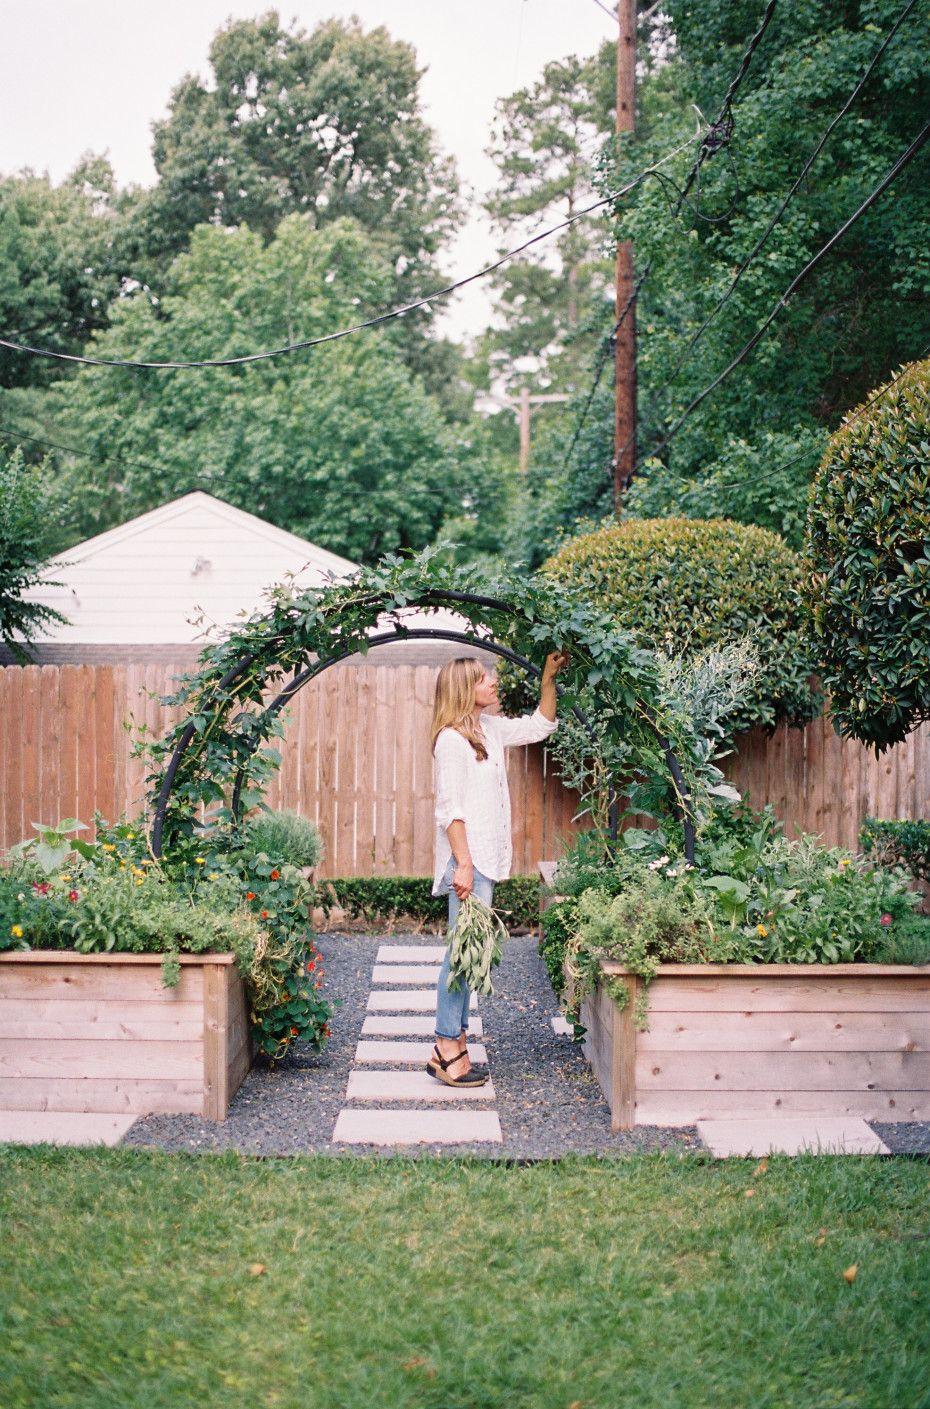 arch trellis ideas for the kitchen garden gardenary in 2020 backyard garden beds backyard on kitchen garden id=80020